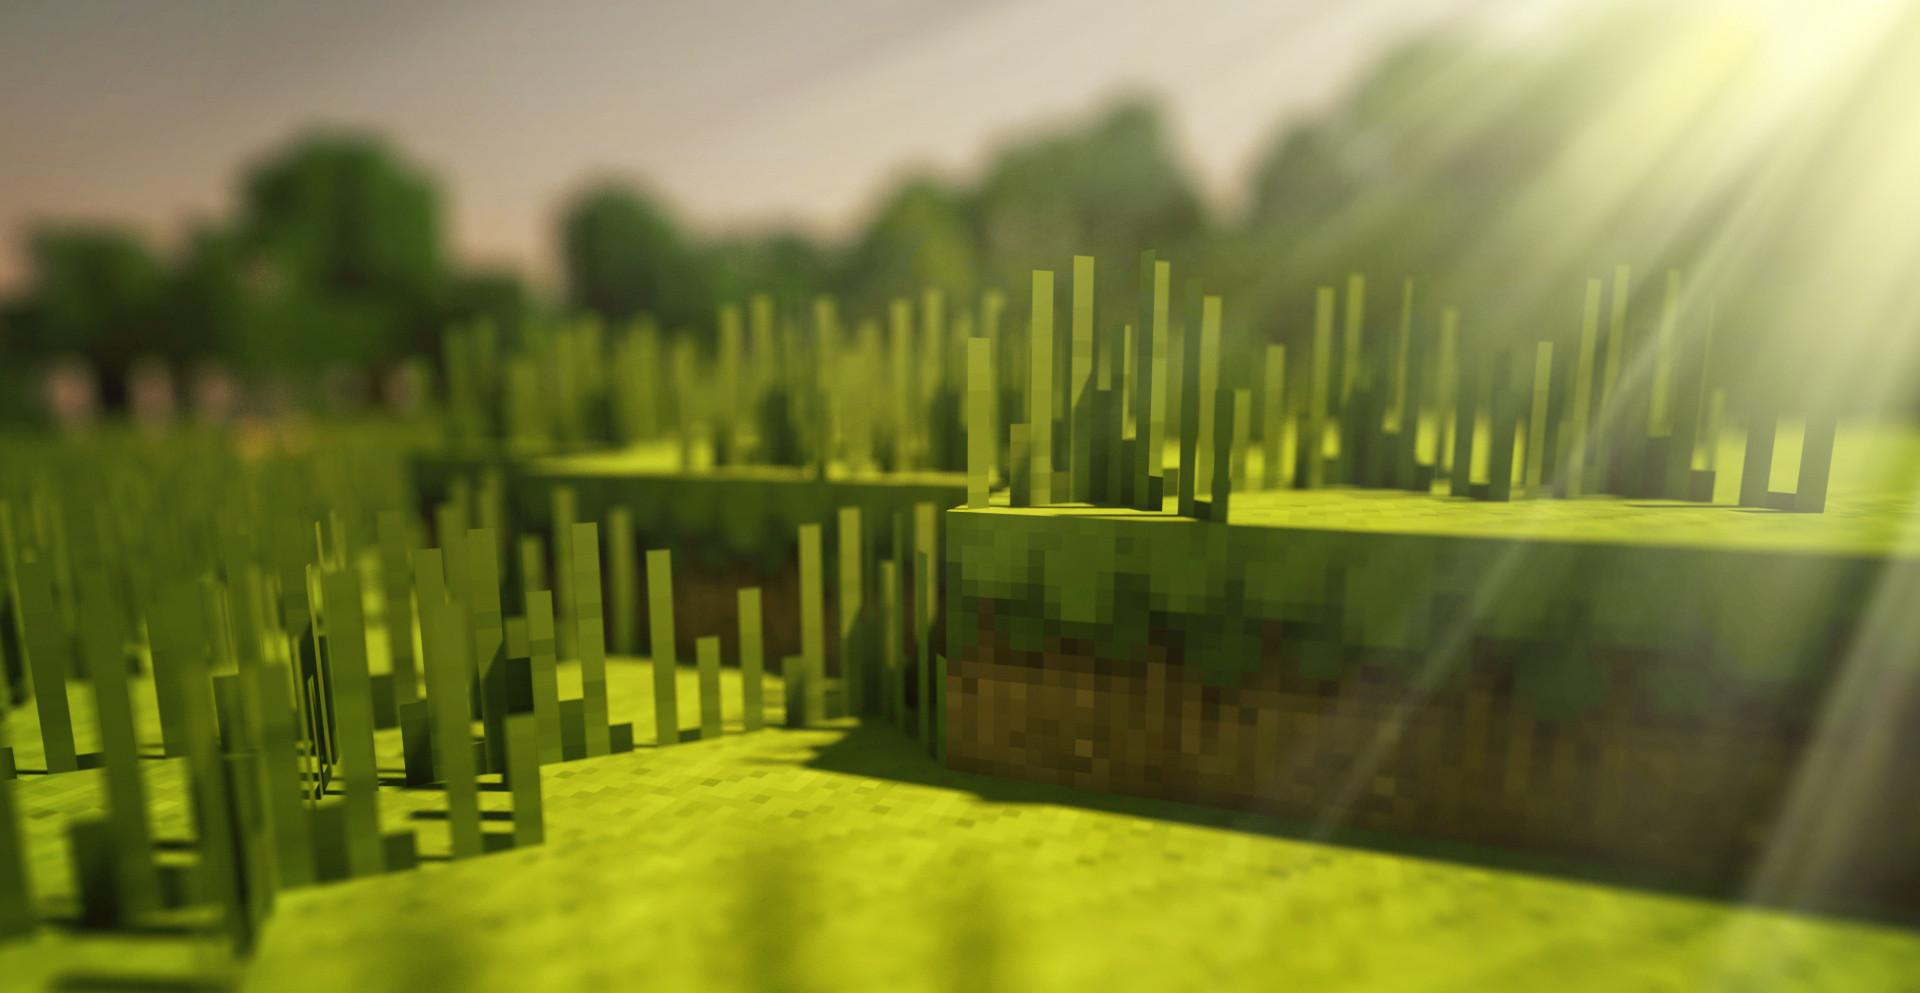 31+] Wallpaper Mod for Minecraft 1 8 on WallpaperSafari